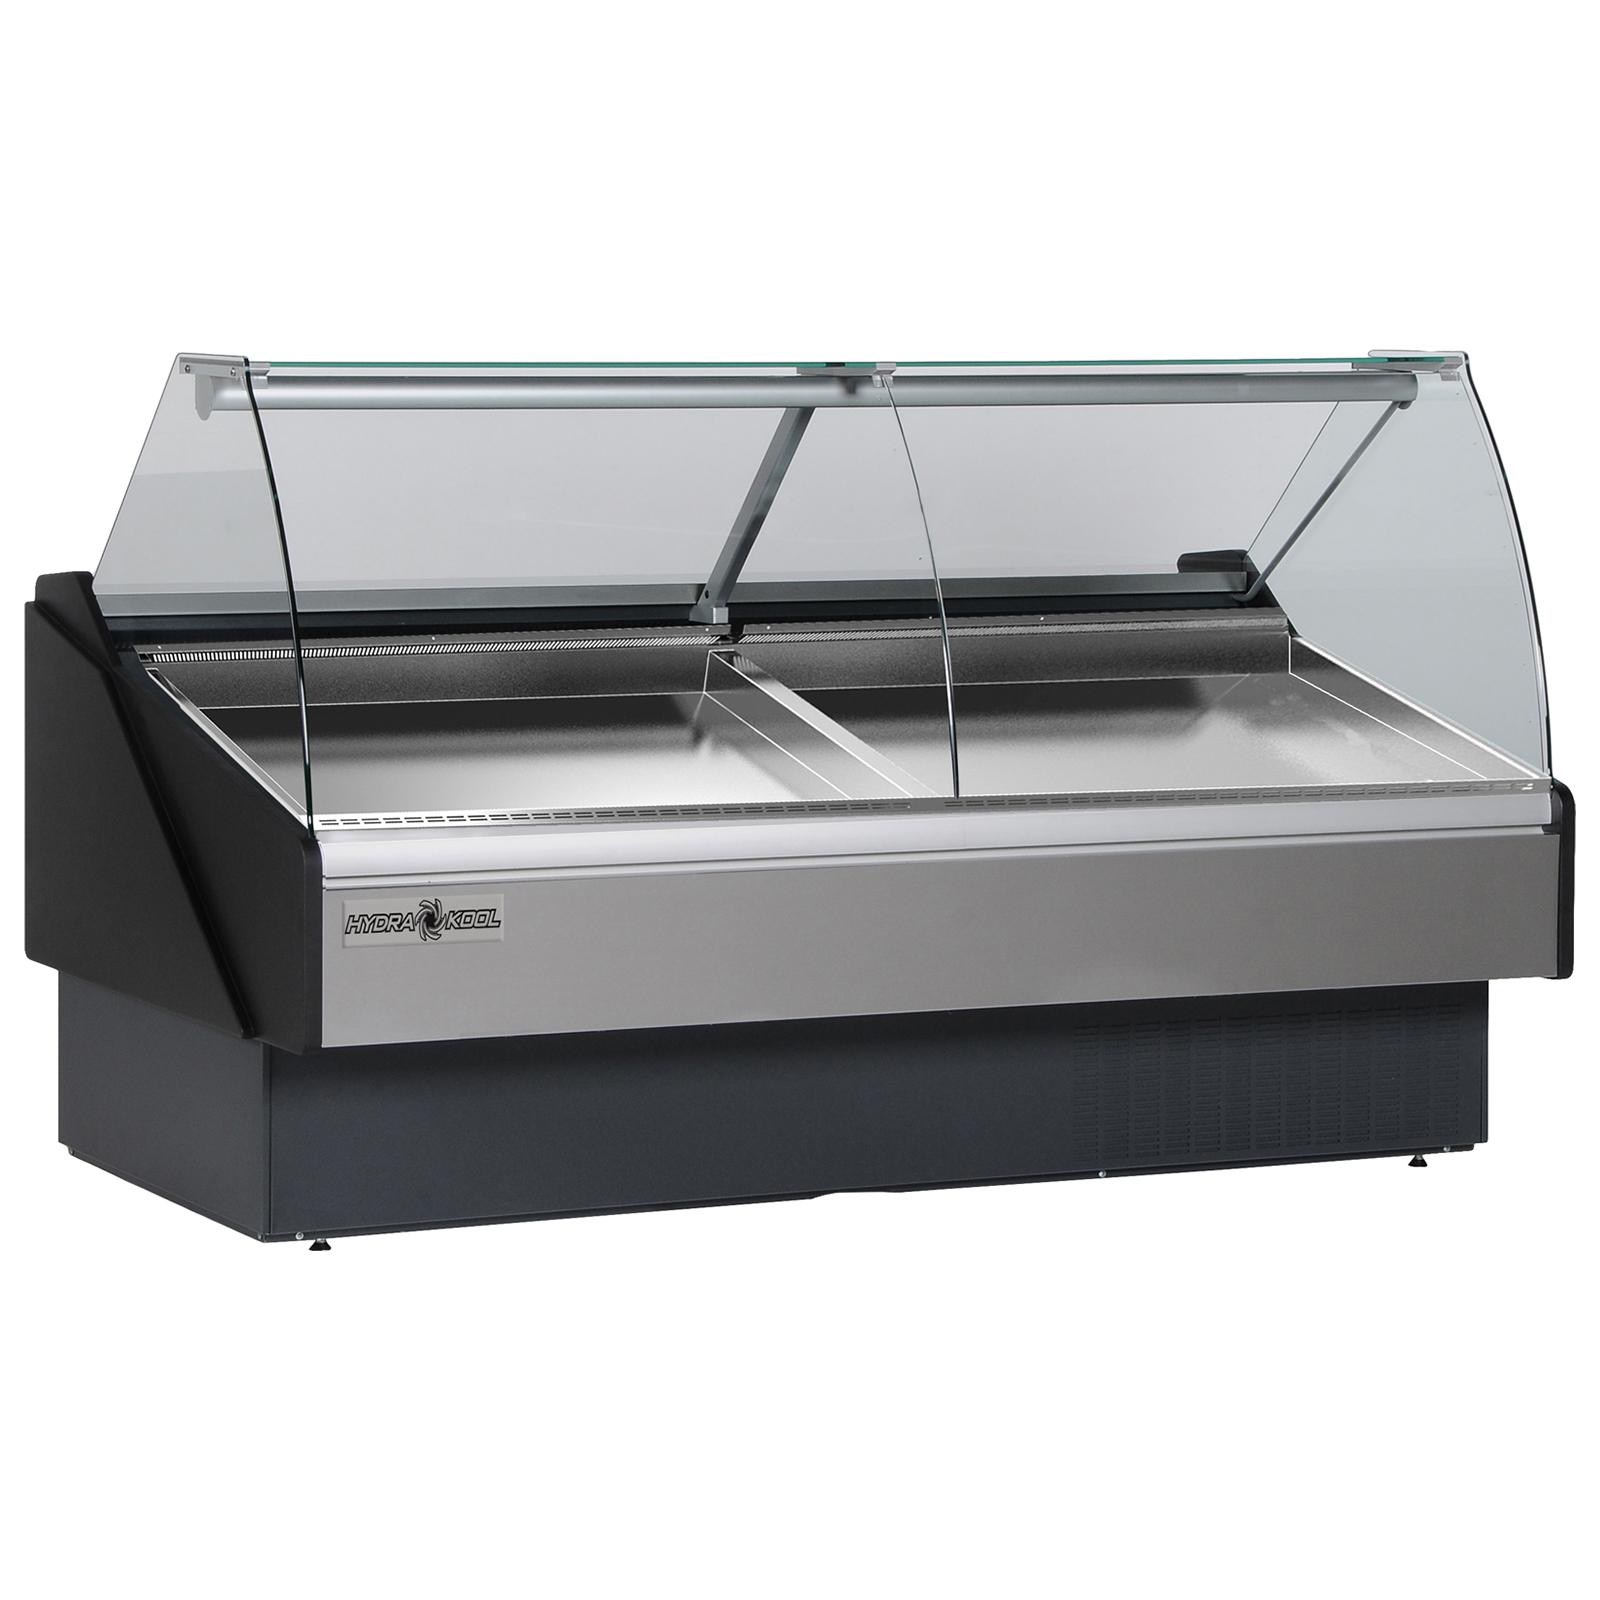 MVP KFM-SC-100-R display case, deli seafood / poultry